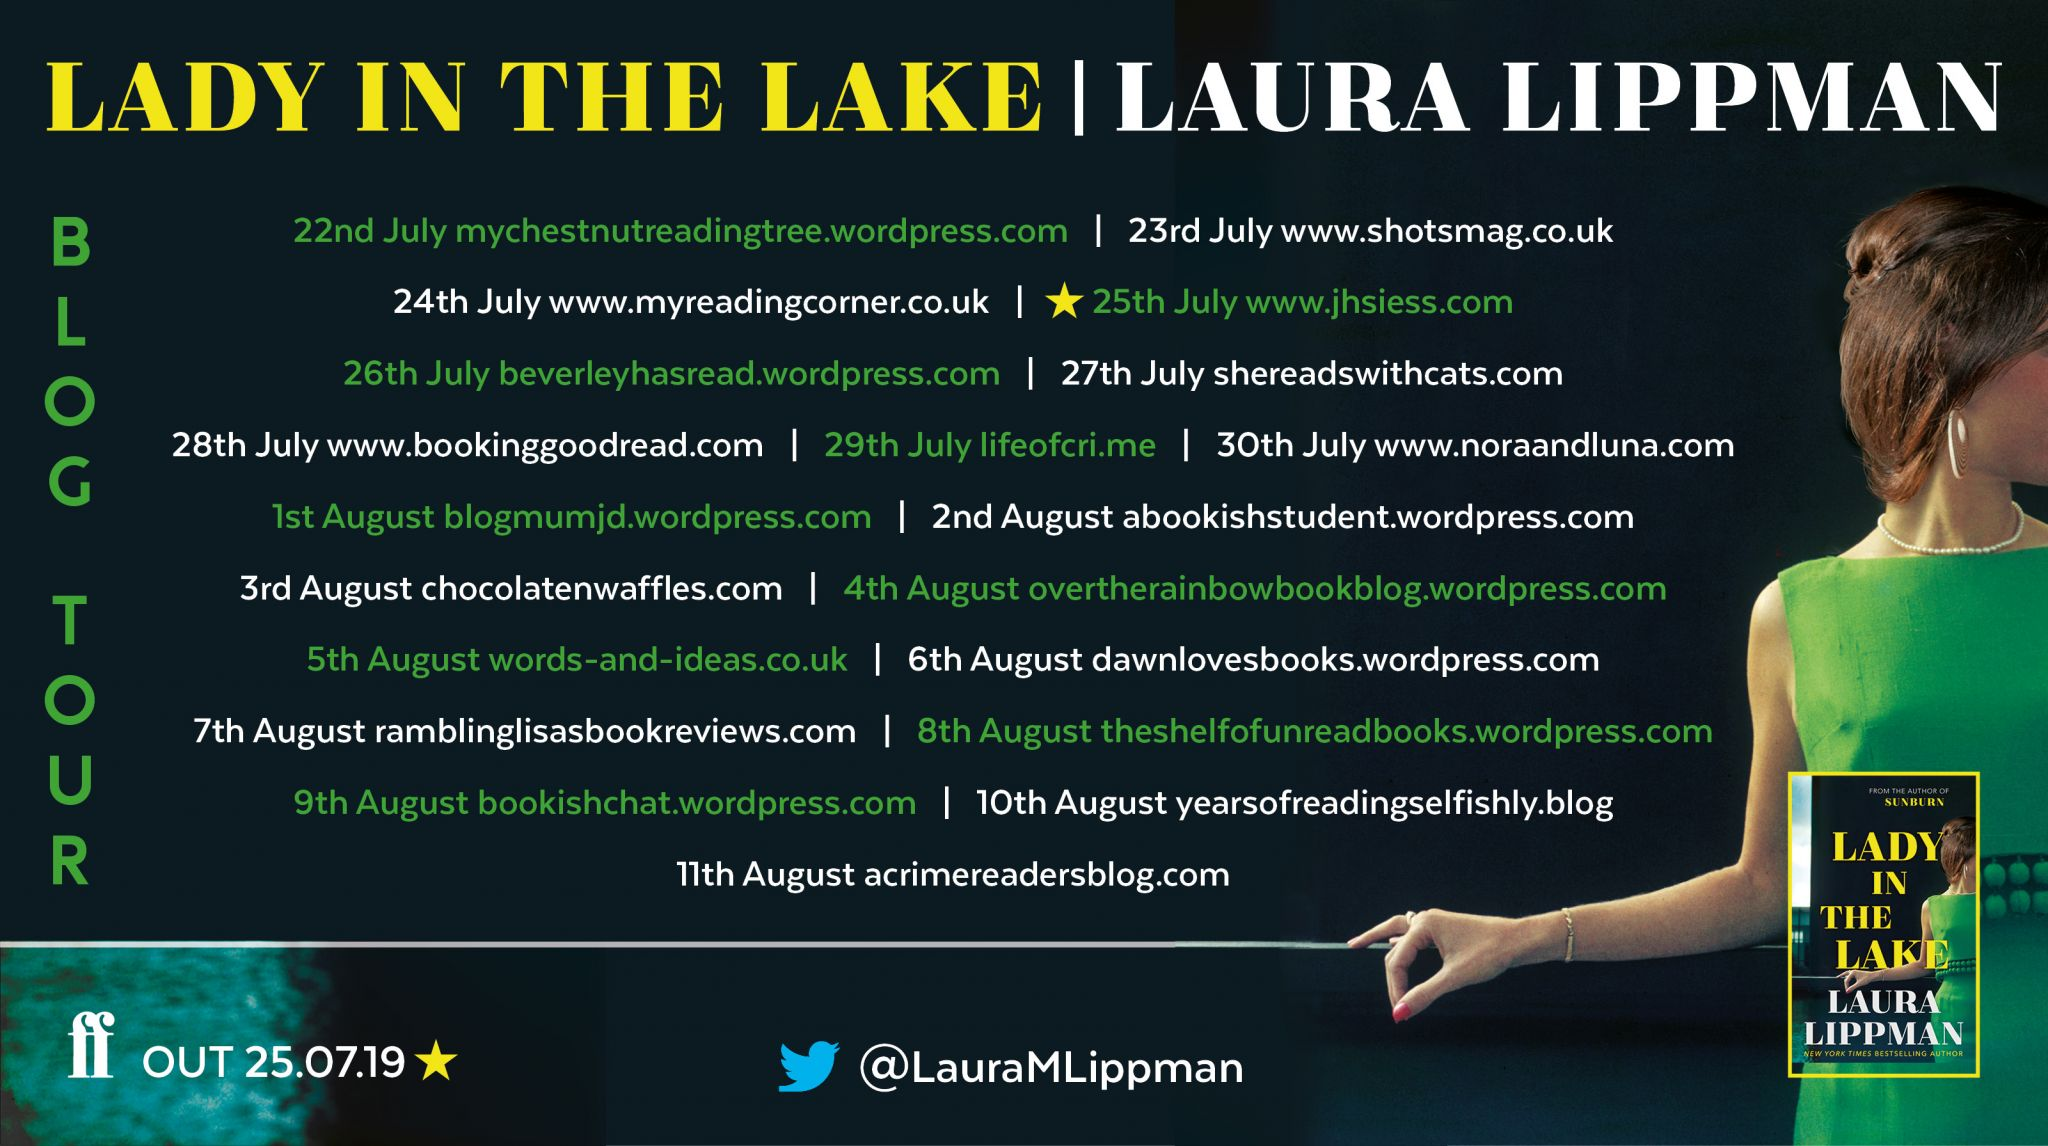 Lady in the Lake – Laura Lippman